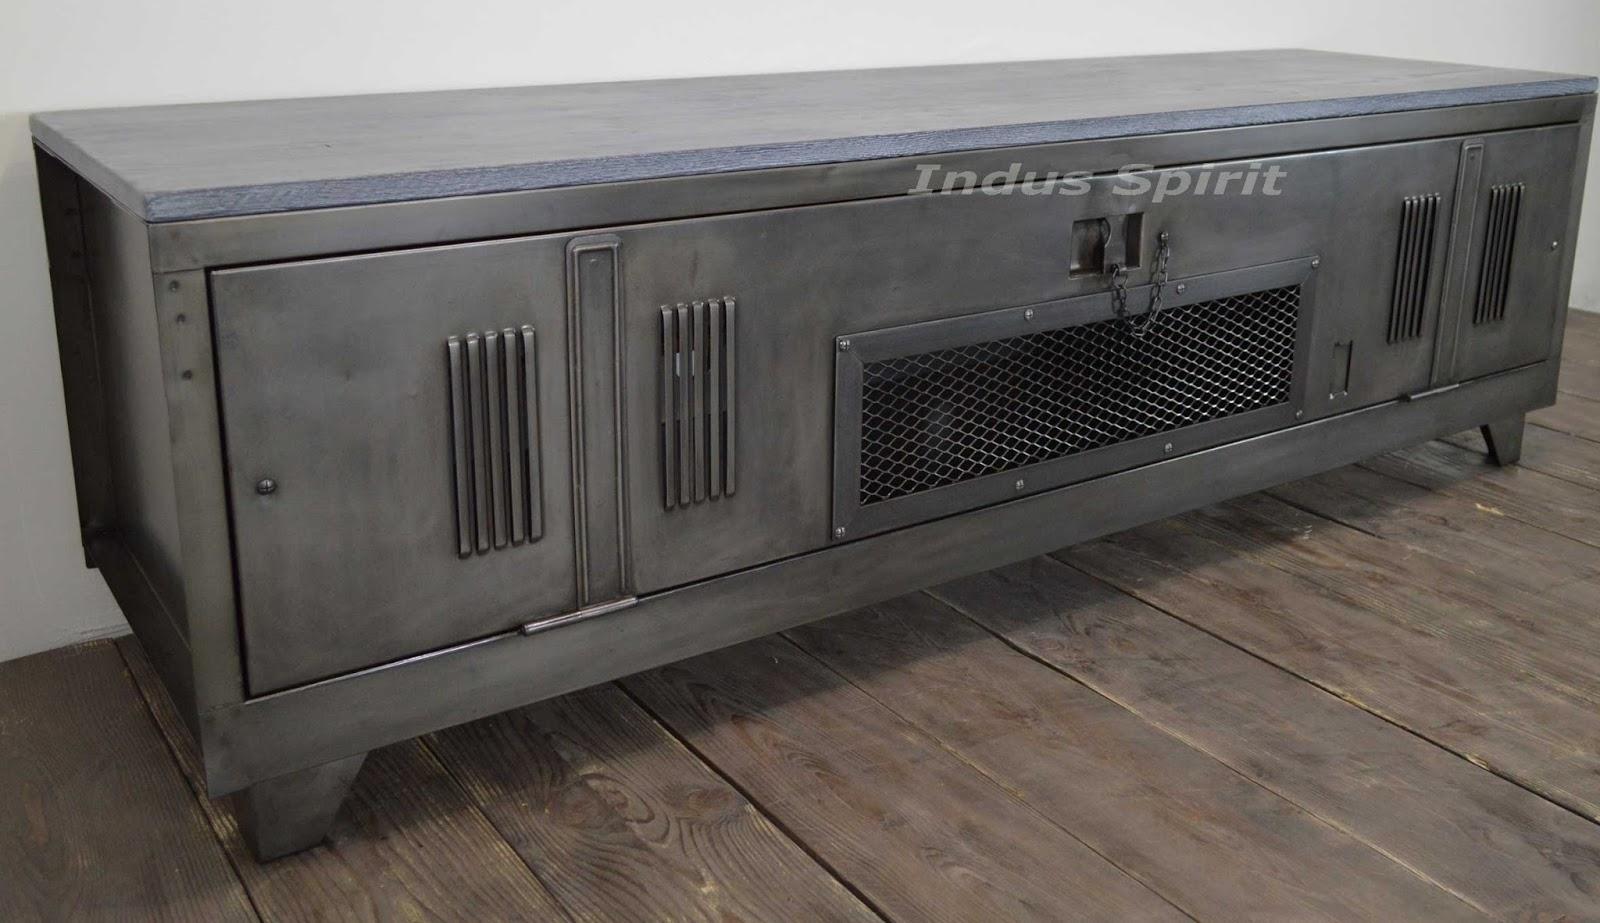 Bien-aimé TV industriel HU05